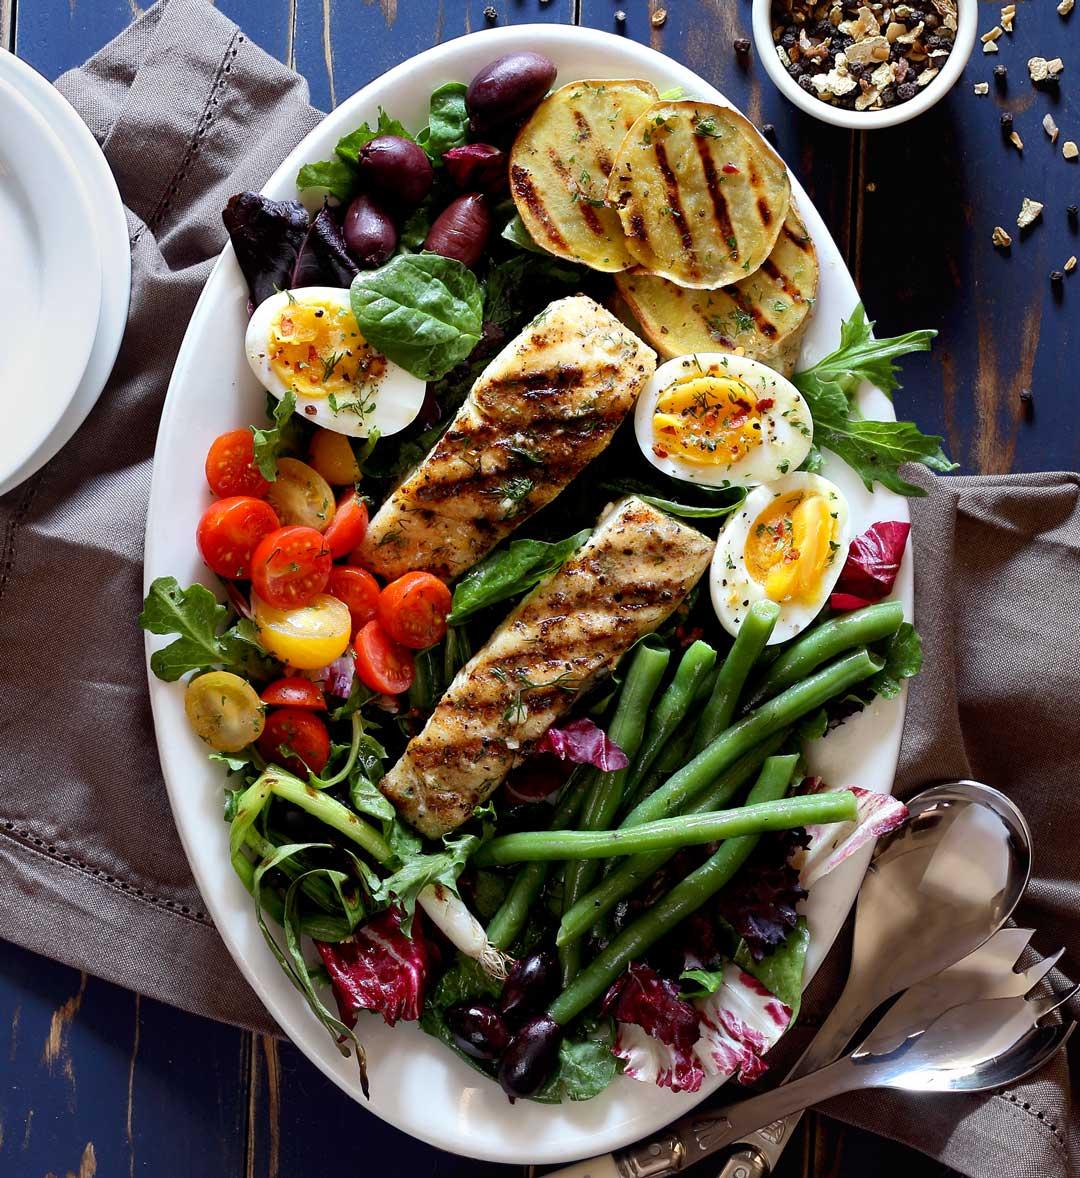 simple recipe for halibut nicoise salad with a lemon and herb vinaigrette